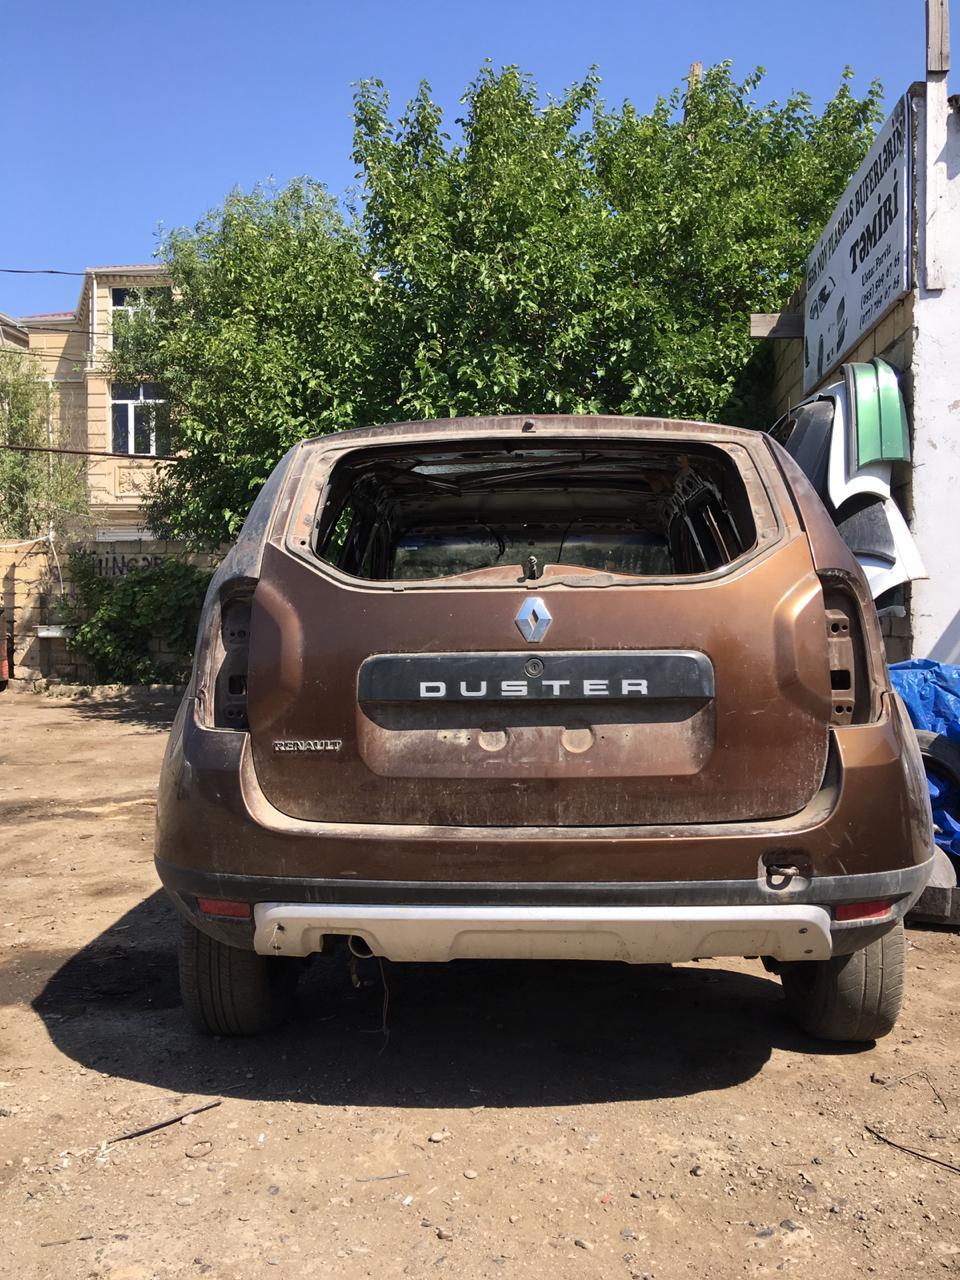 Renault Duster 2.0(lt) 2013 Подержанный  $3900